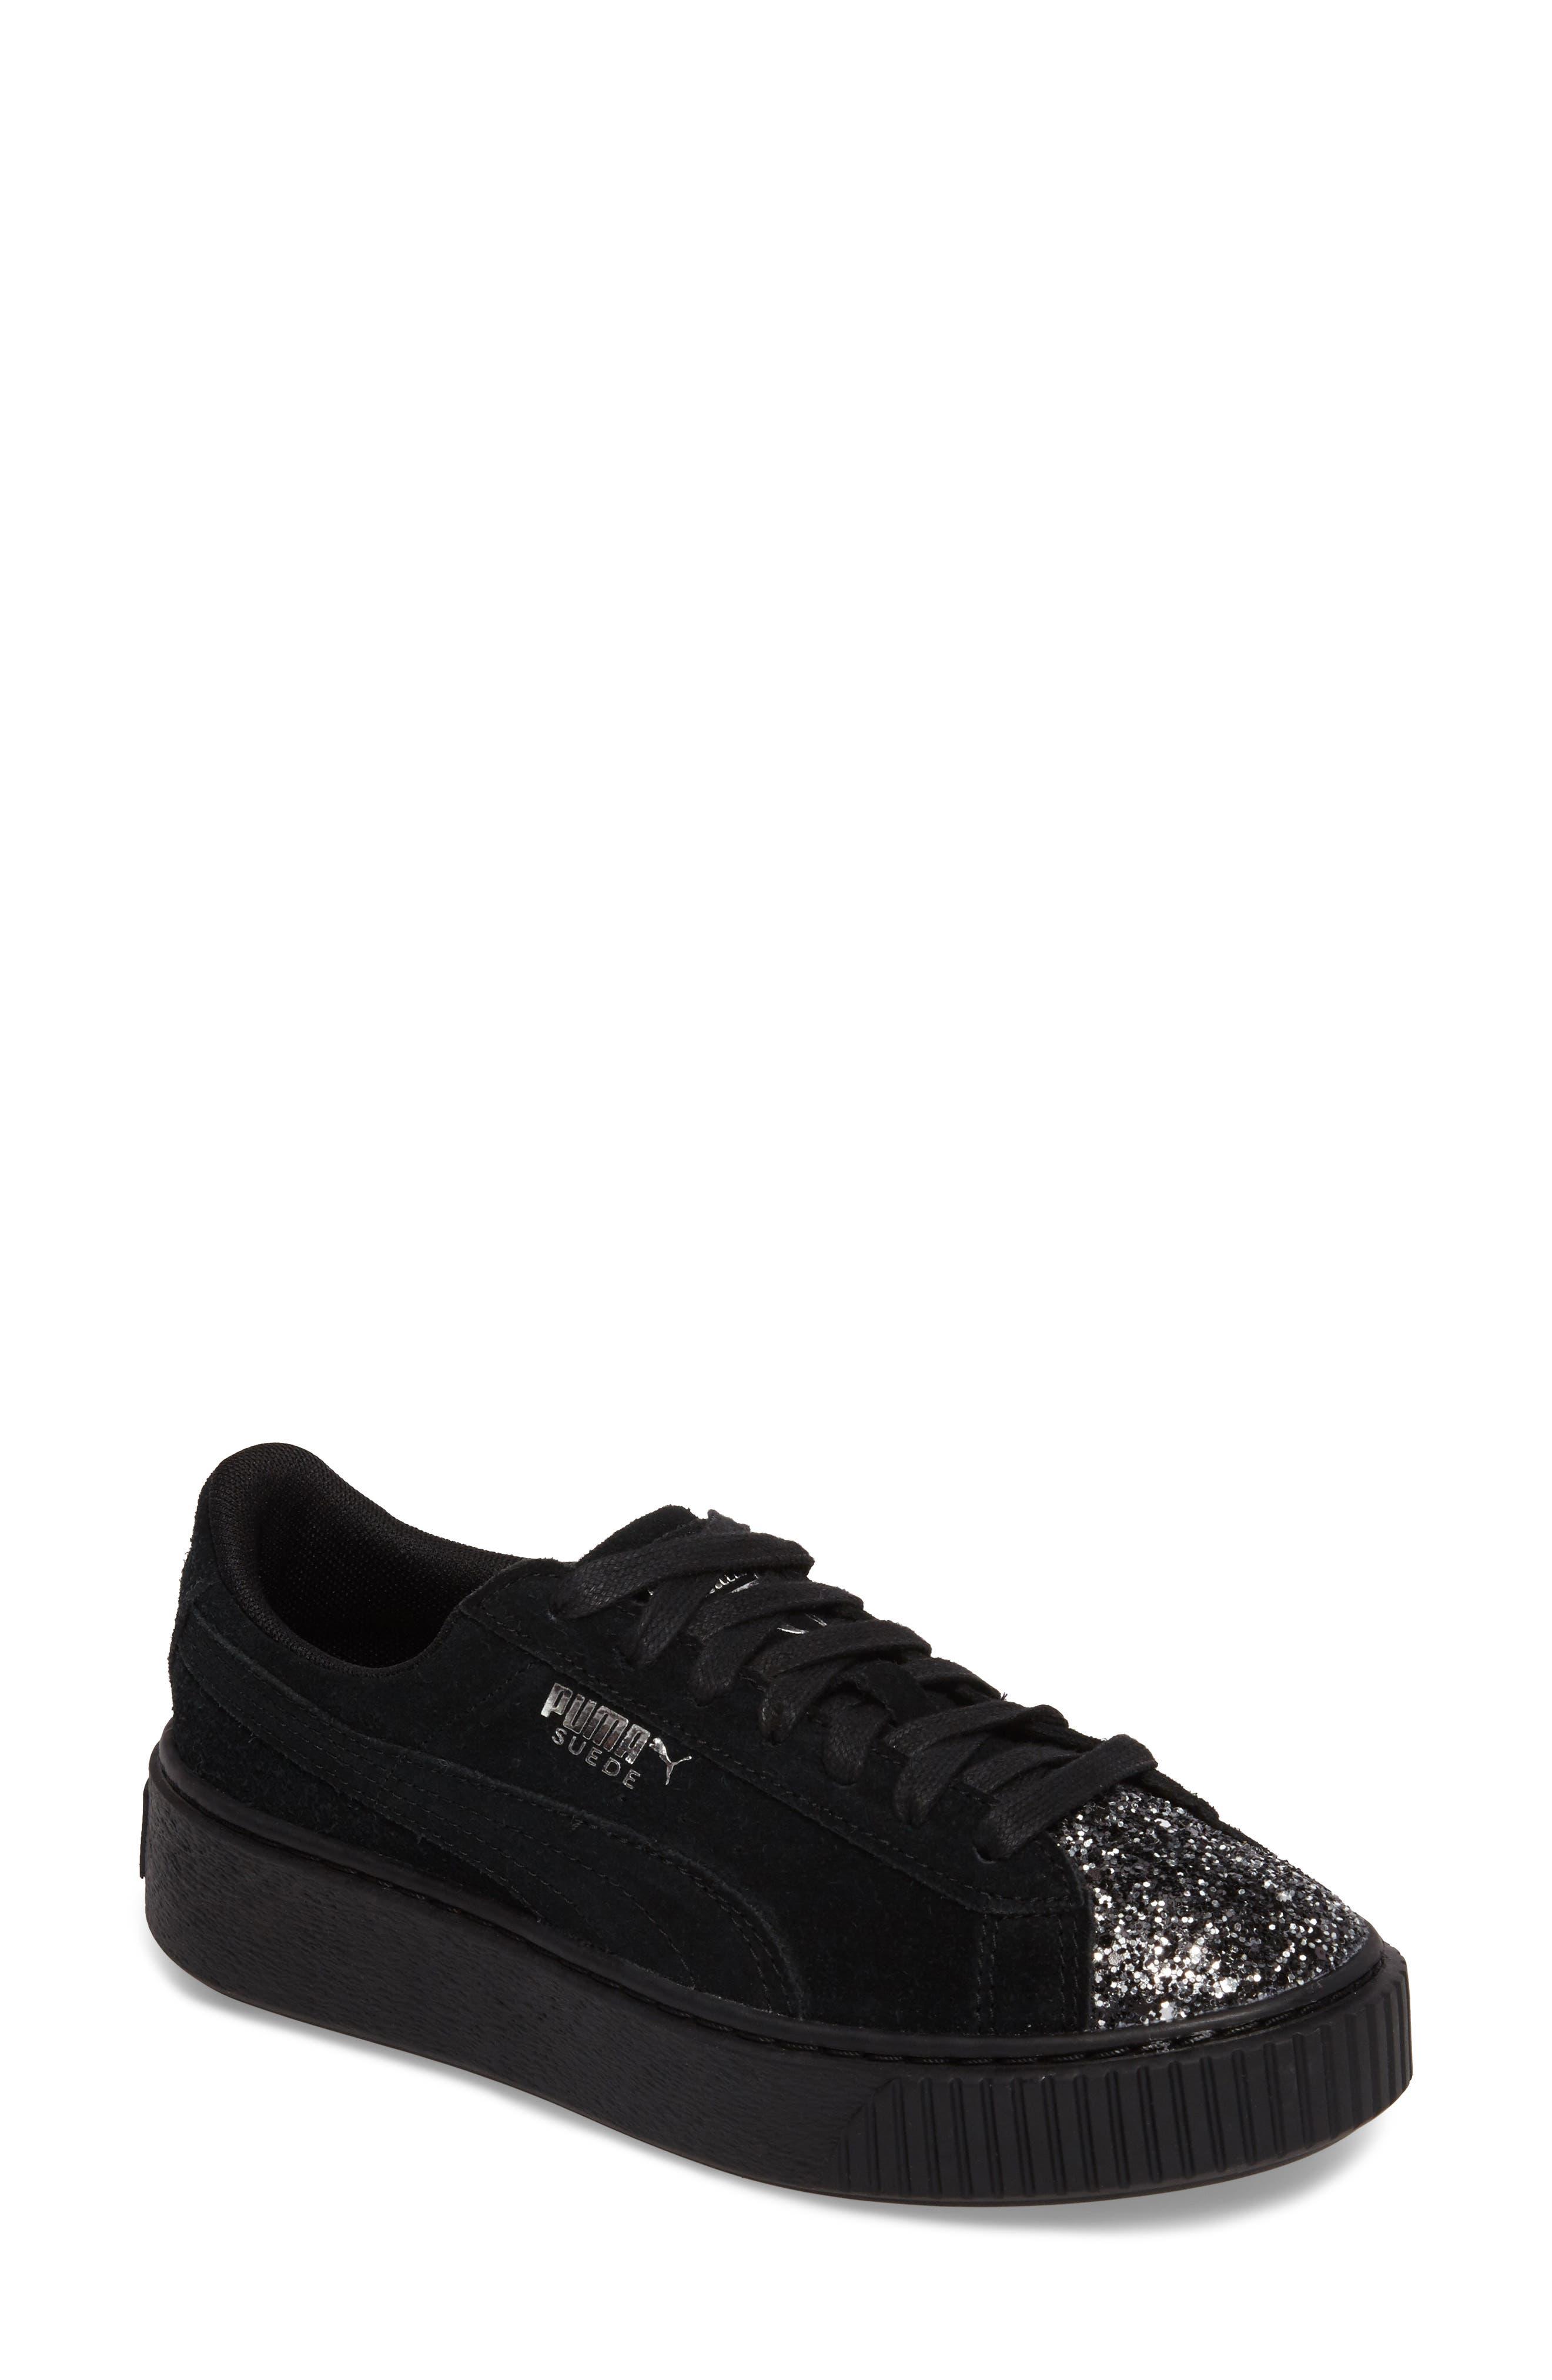 Main Image - PUMA Elemental Platform Sneaker (Women)